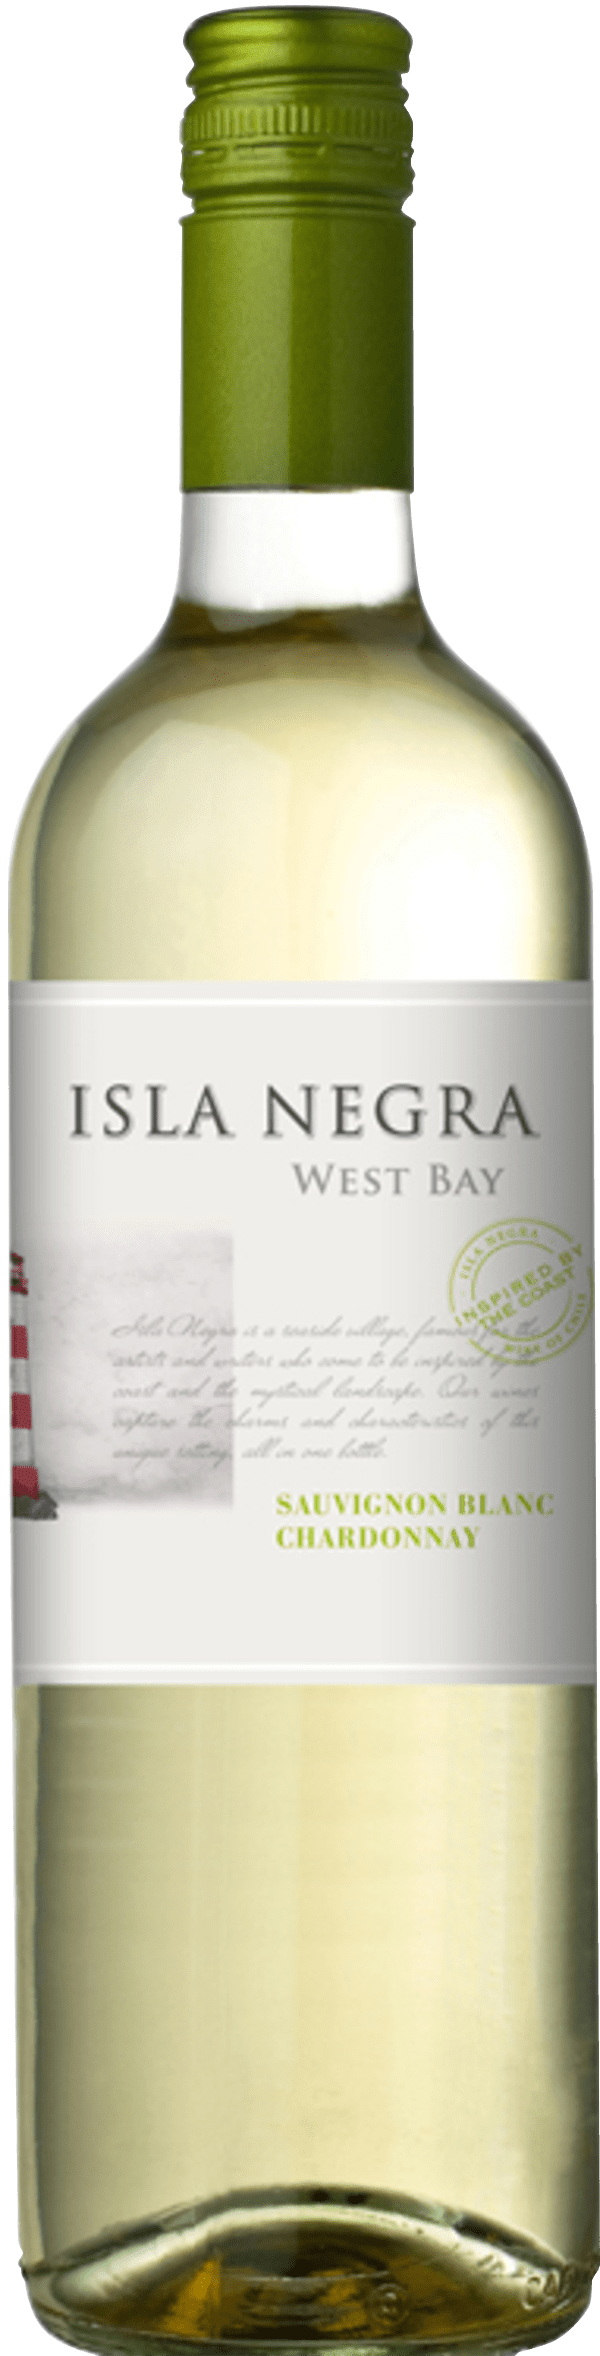 IslaNegra Sauvignon Blanc-Chardonnay